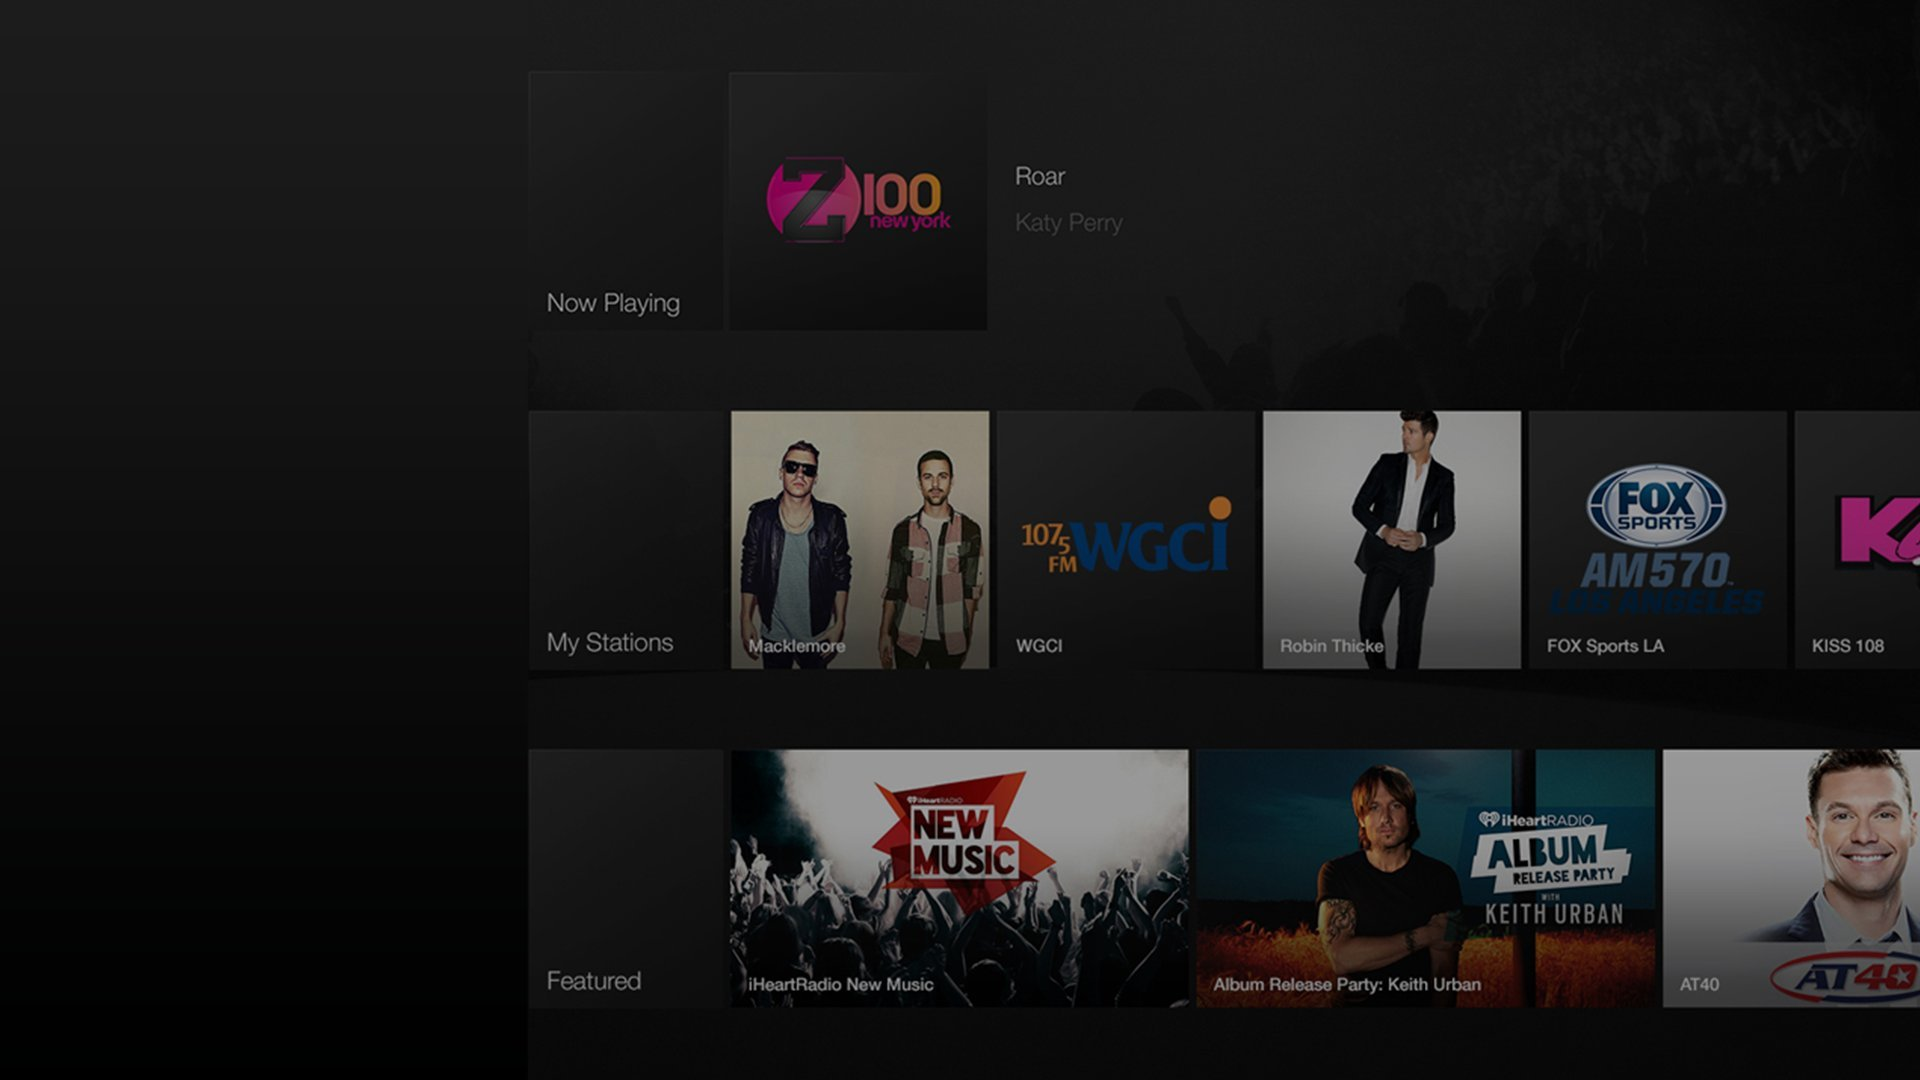 iHeartRadio TV